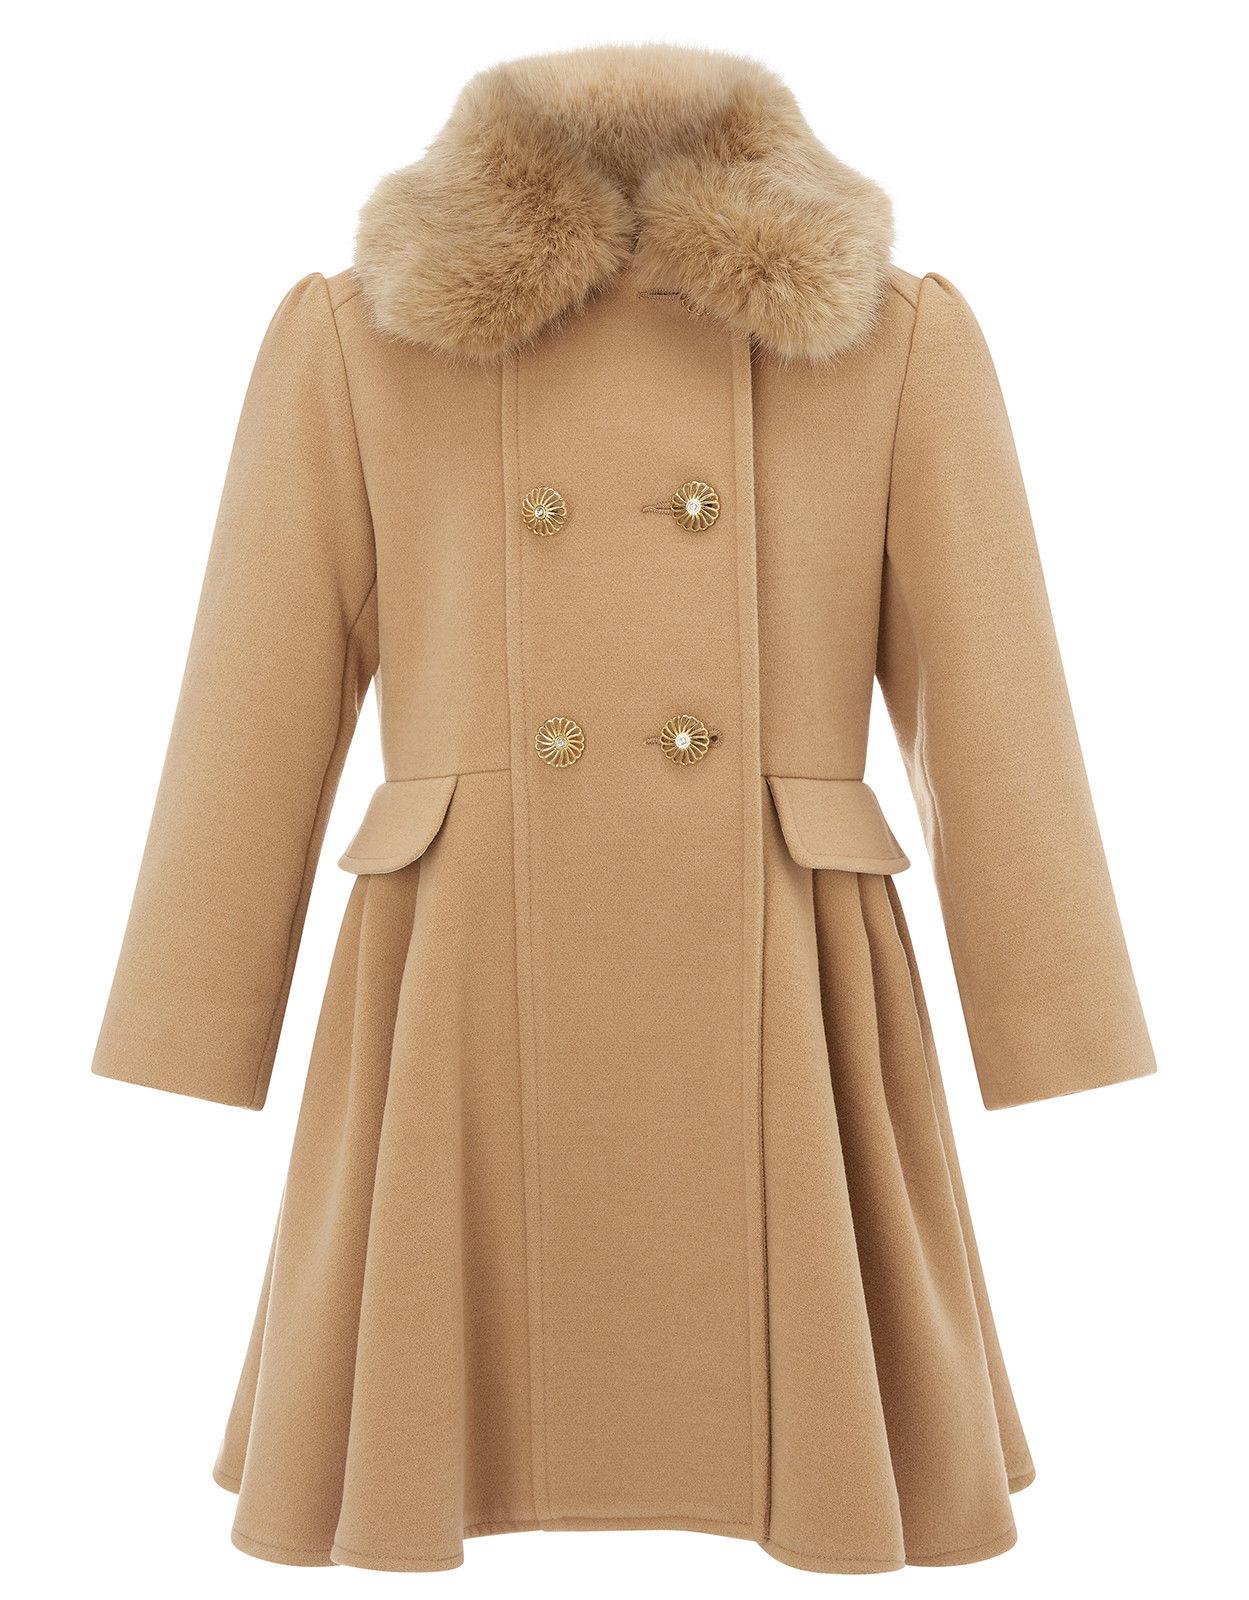 4be7b53046c2 Girls Monsoon Beige Natalia Fur Swing Dress Fit Flare Jacket Coat 3 ...